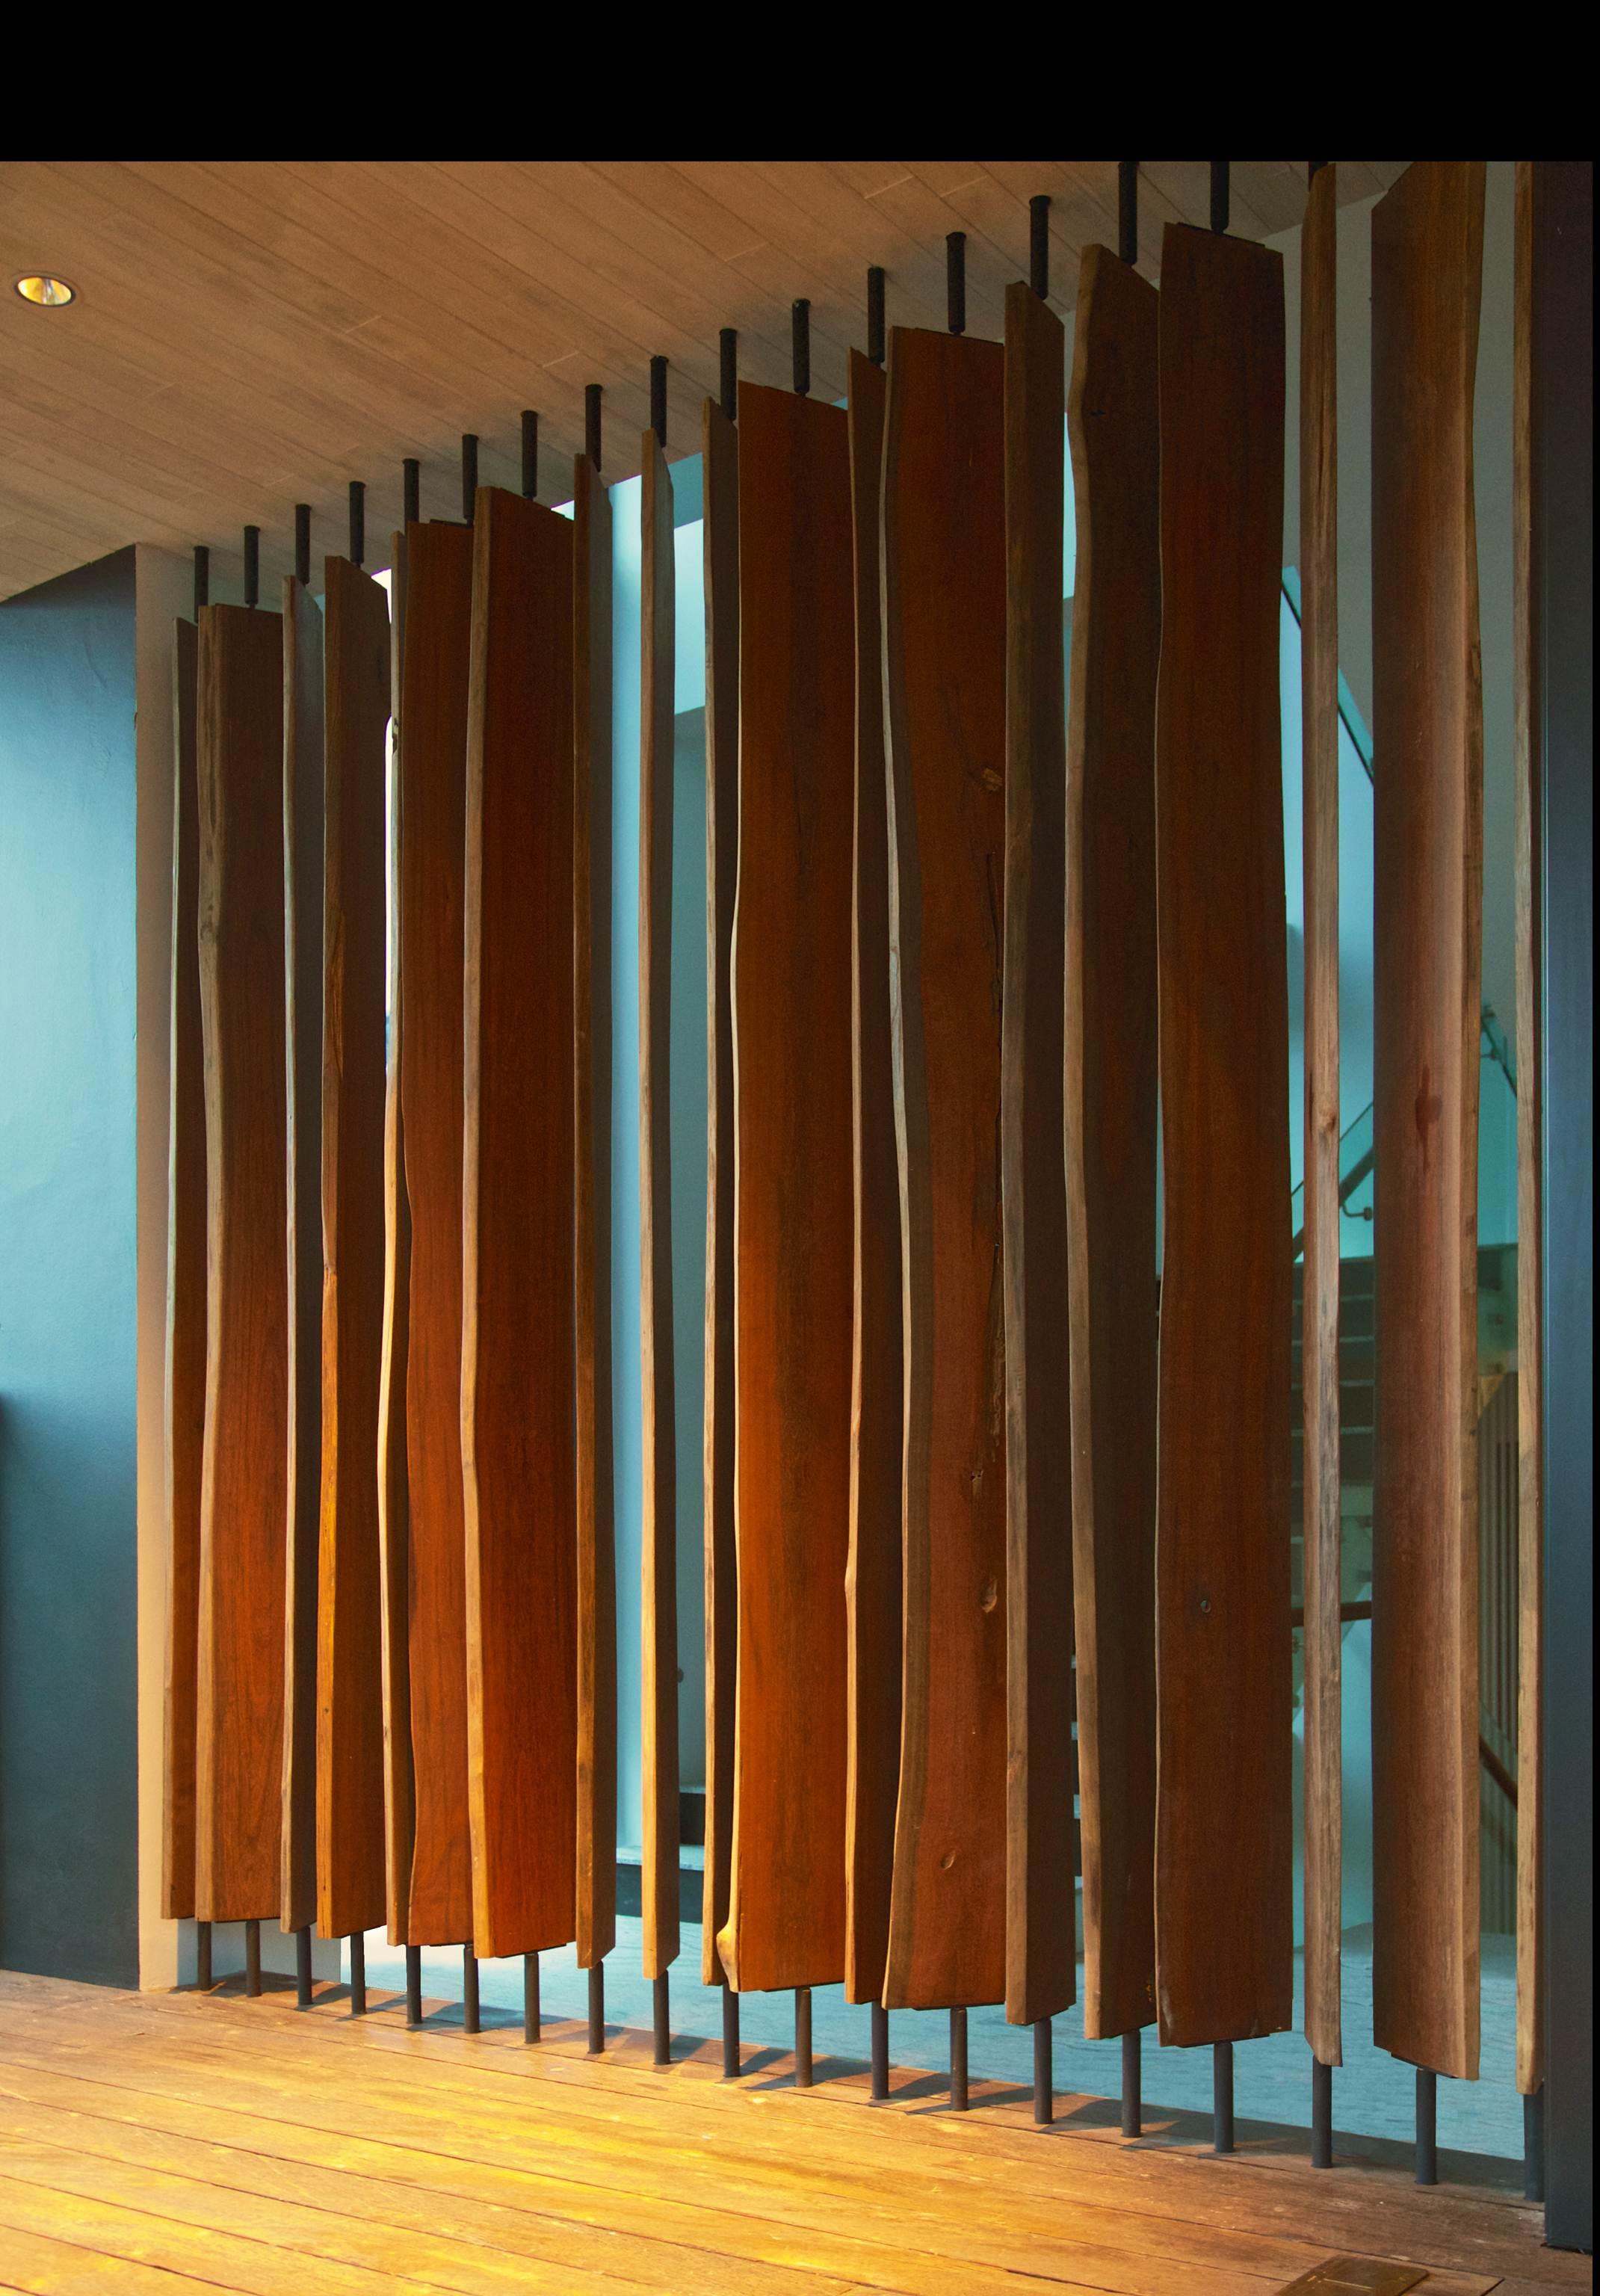 Panels Siding Ulin Interior Design Recycle Wood